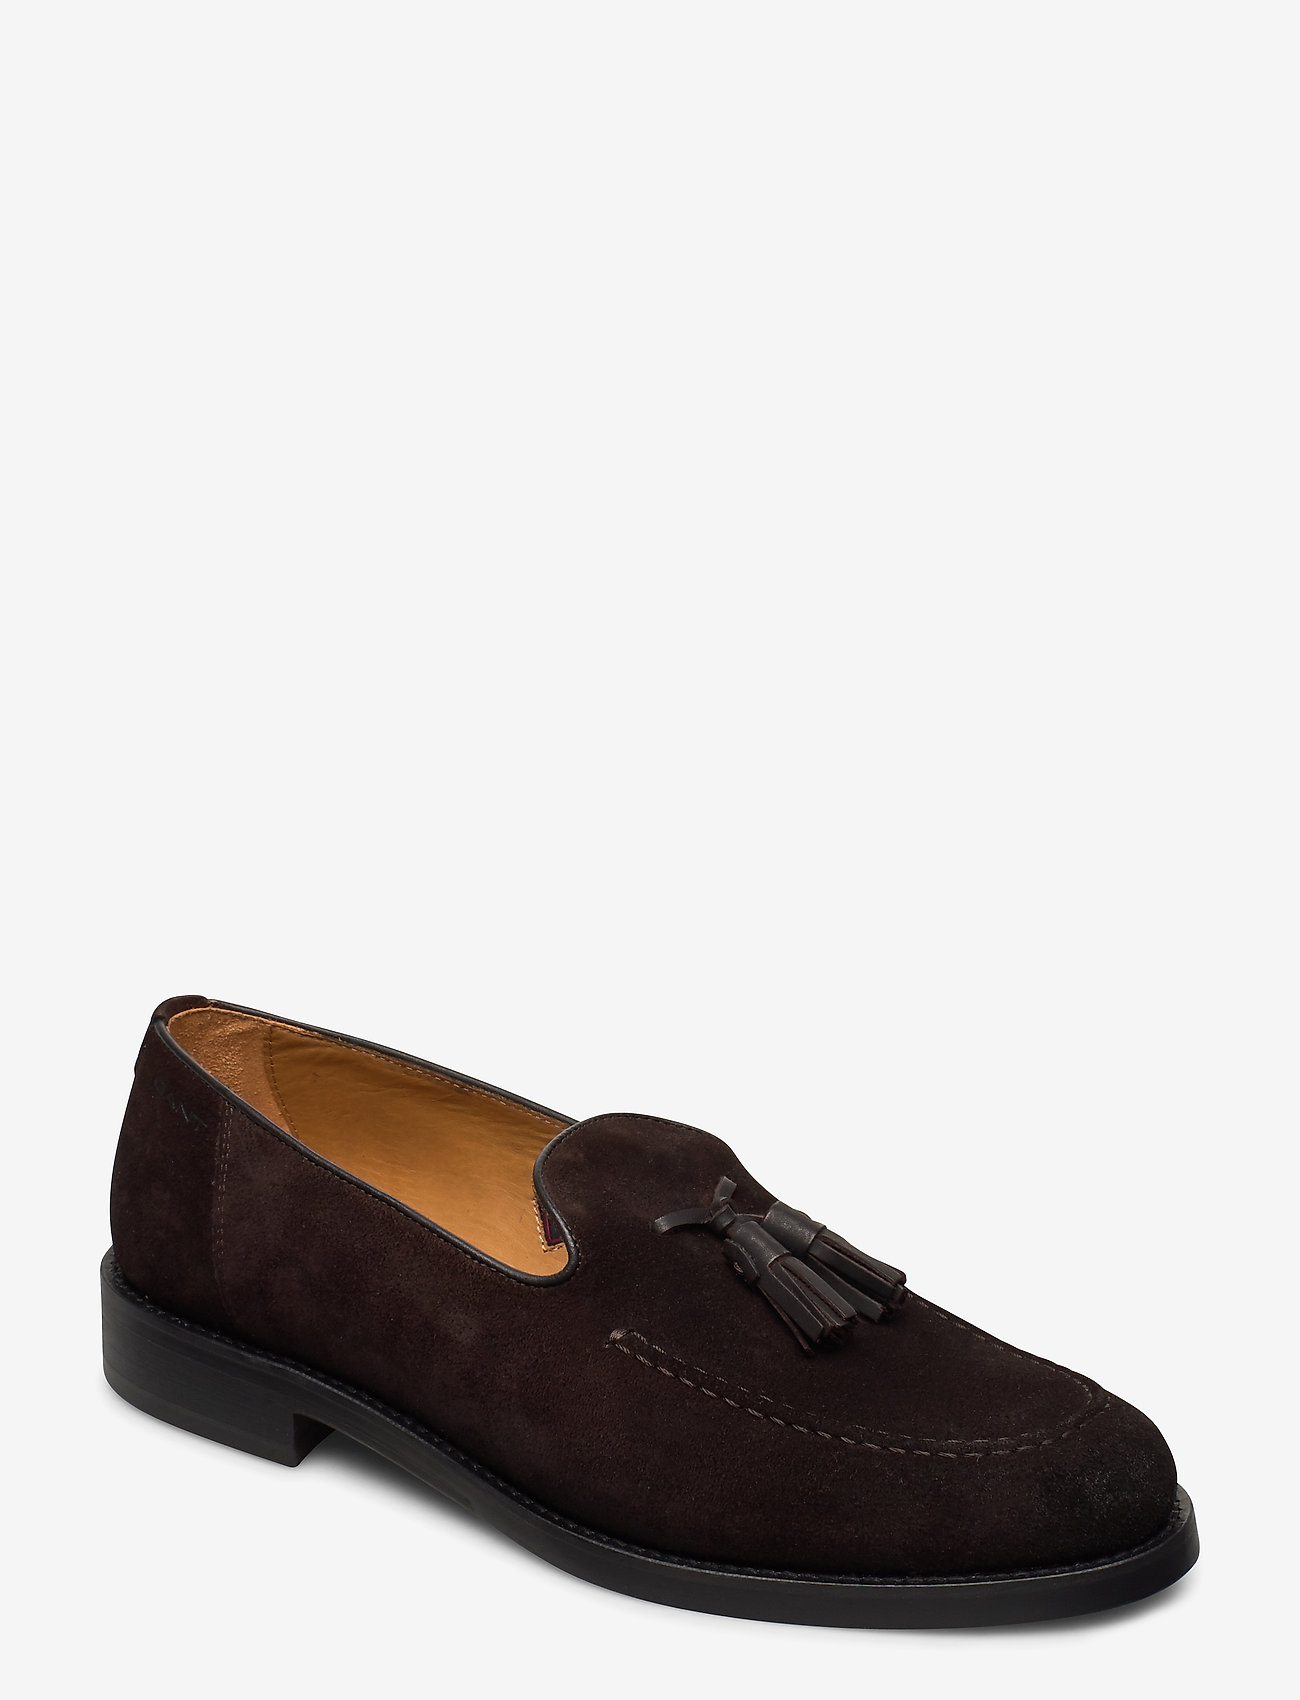 GANT - Almon Slip-on shoes - instappers - dark brown - 0